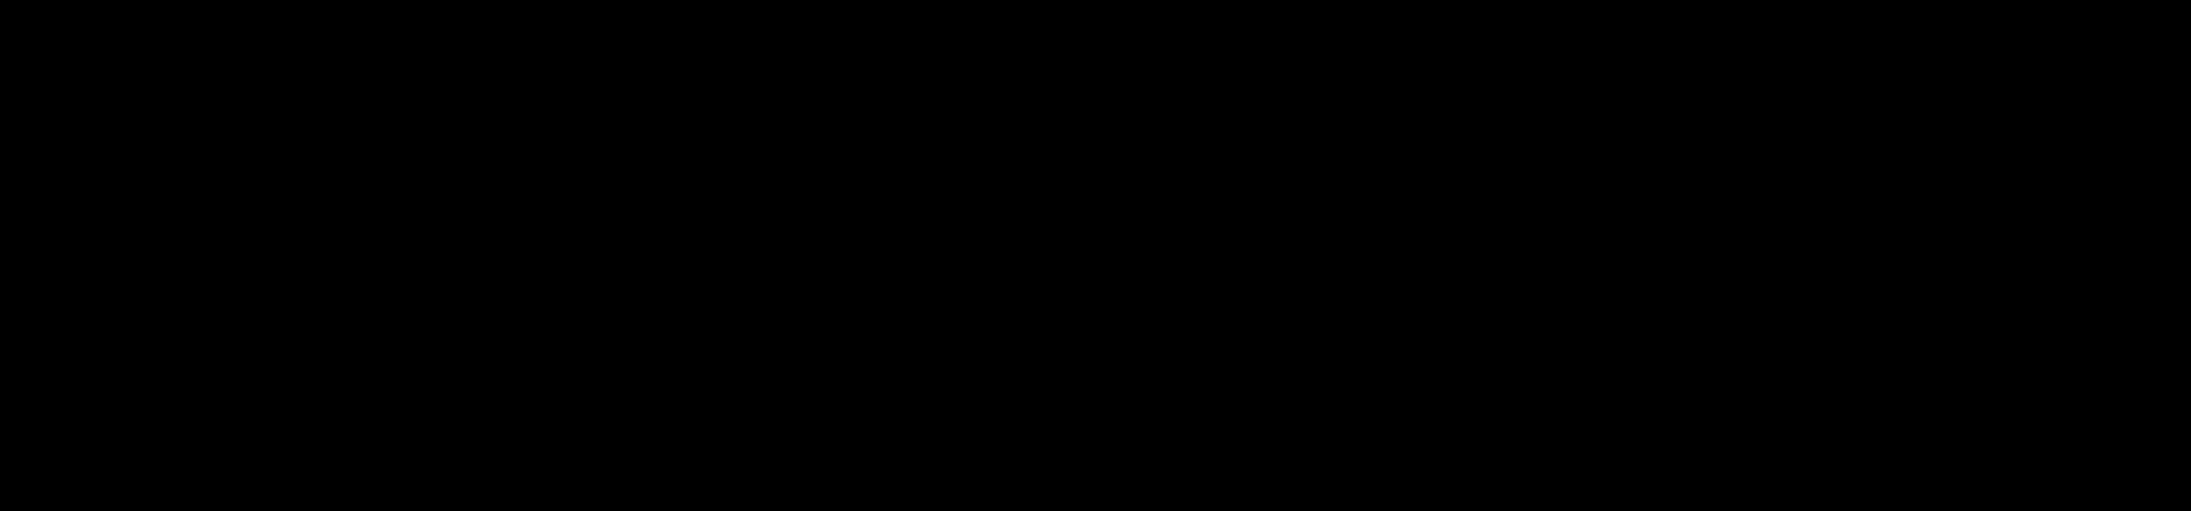 black logo 4 1 -